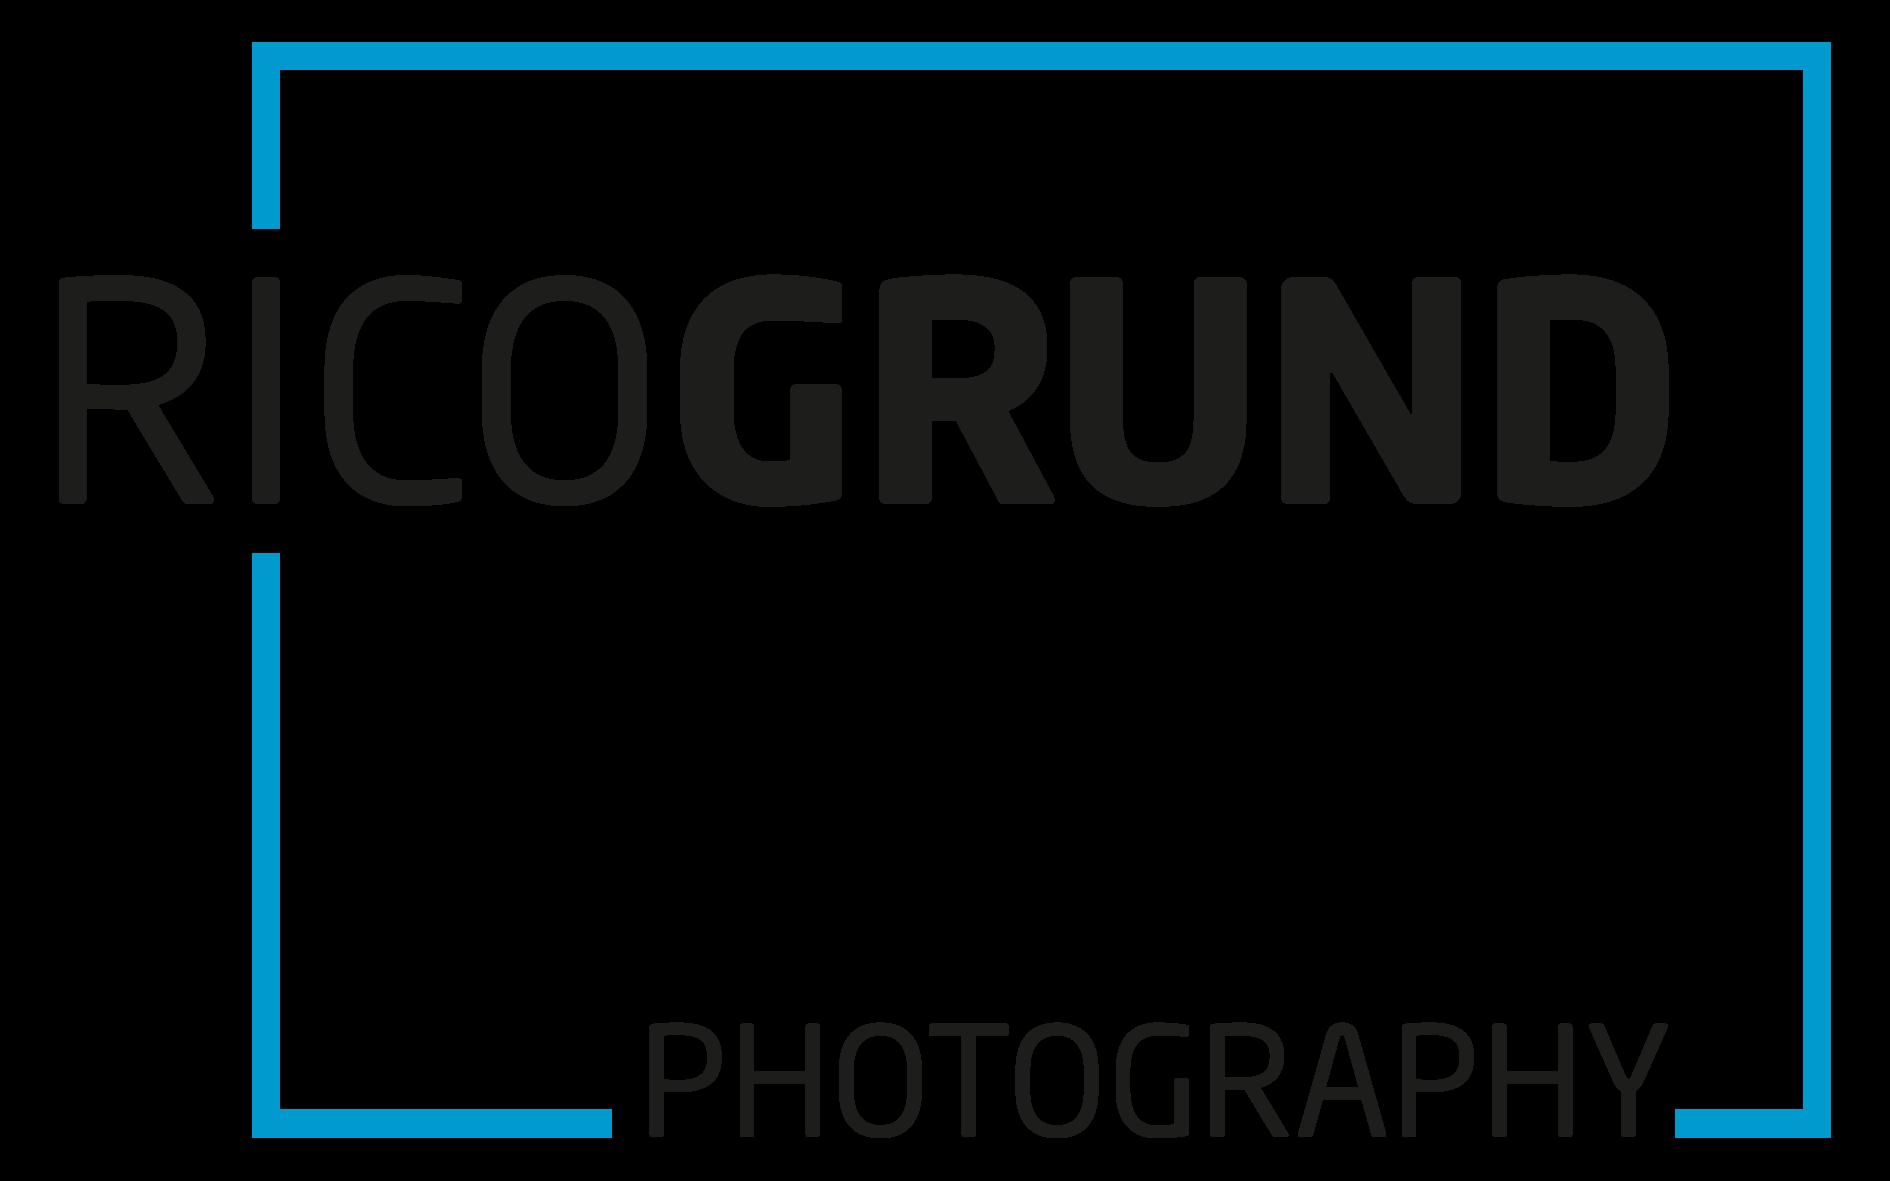 Rico Grund Photography